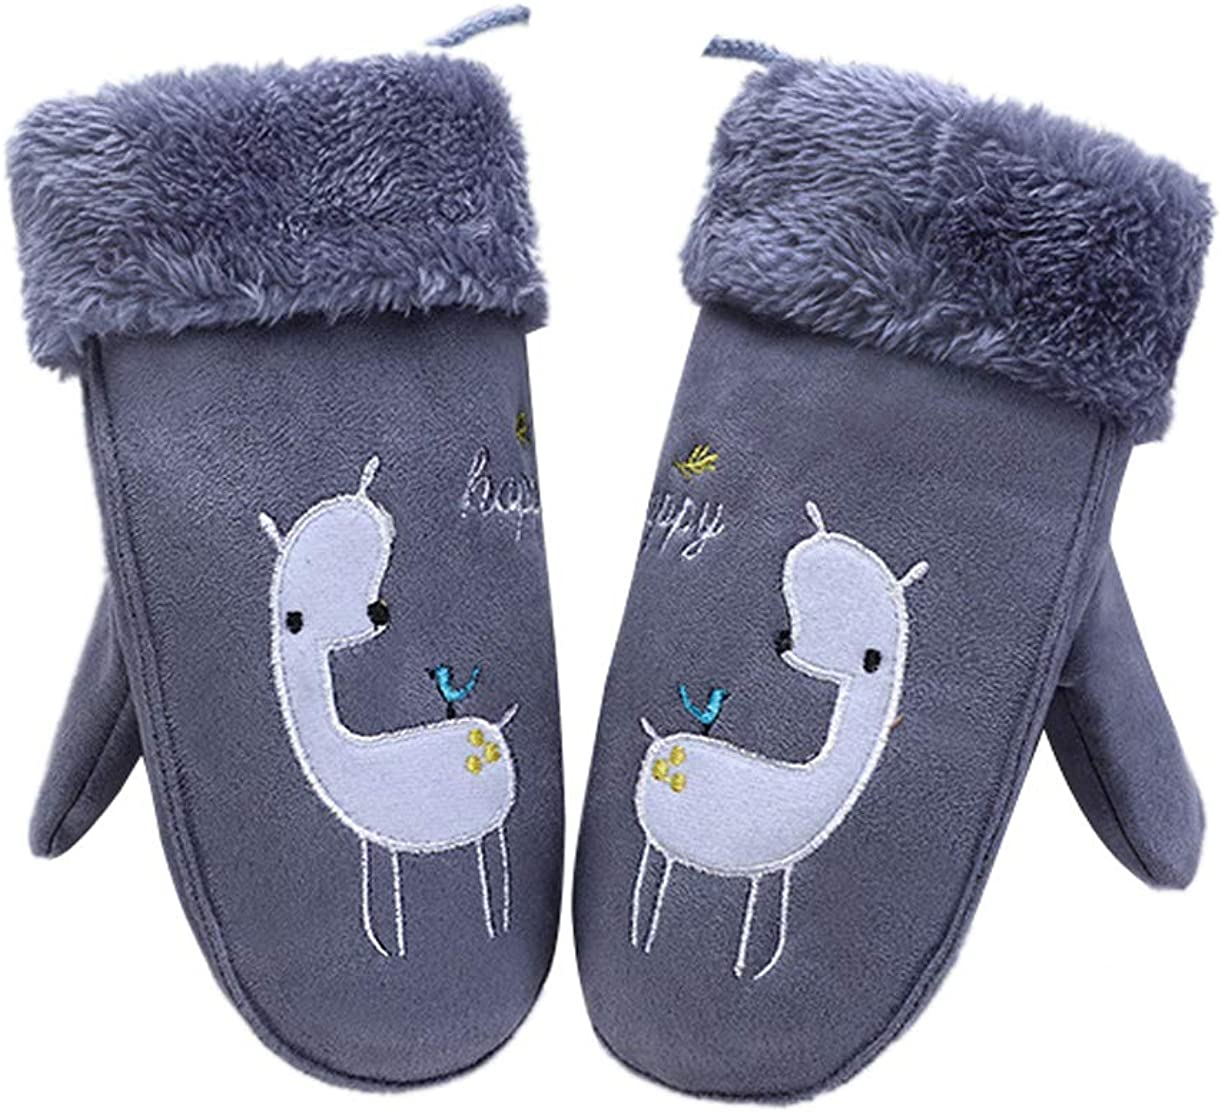 YueLian Little Girl's Alpaca Pattern Fur Lining Cold Weather Mitten Gloves